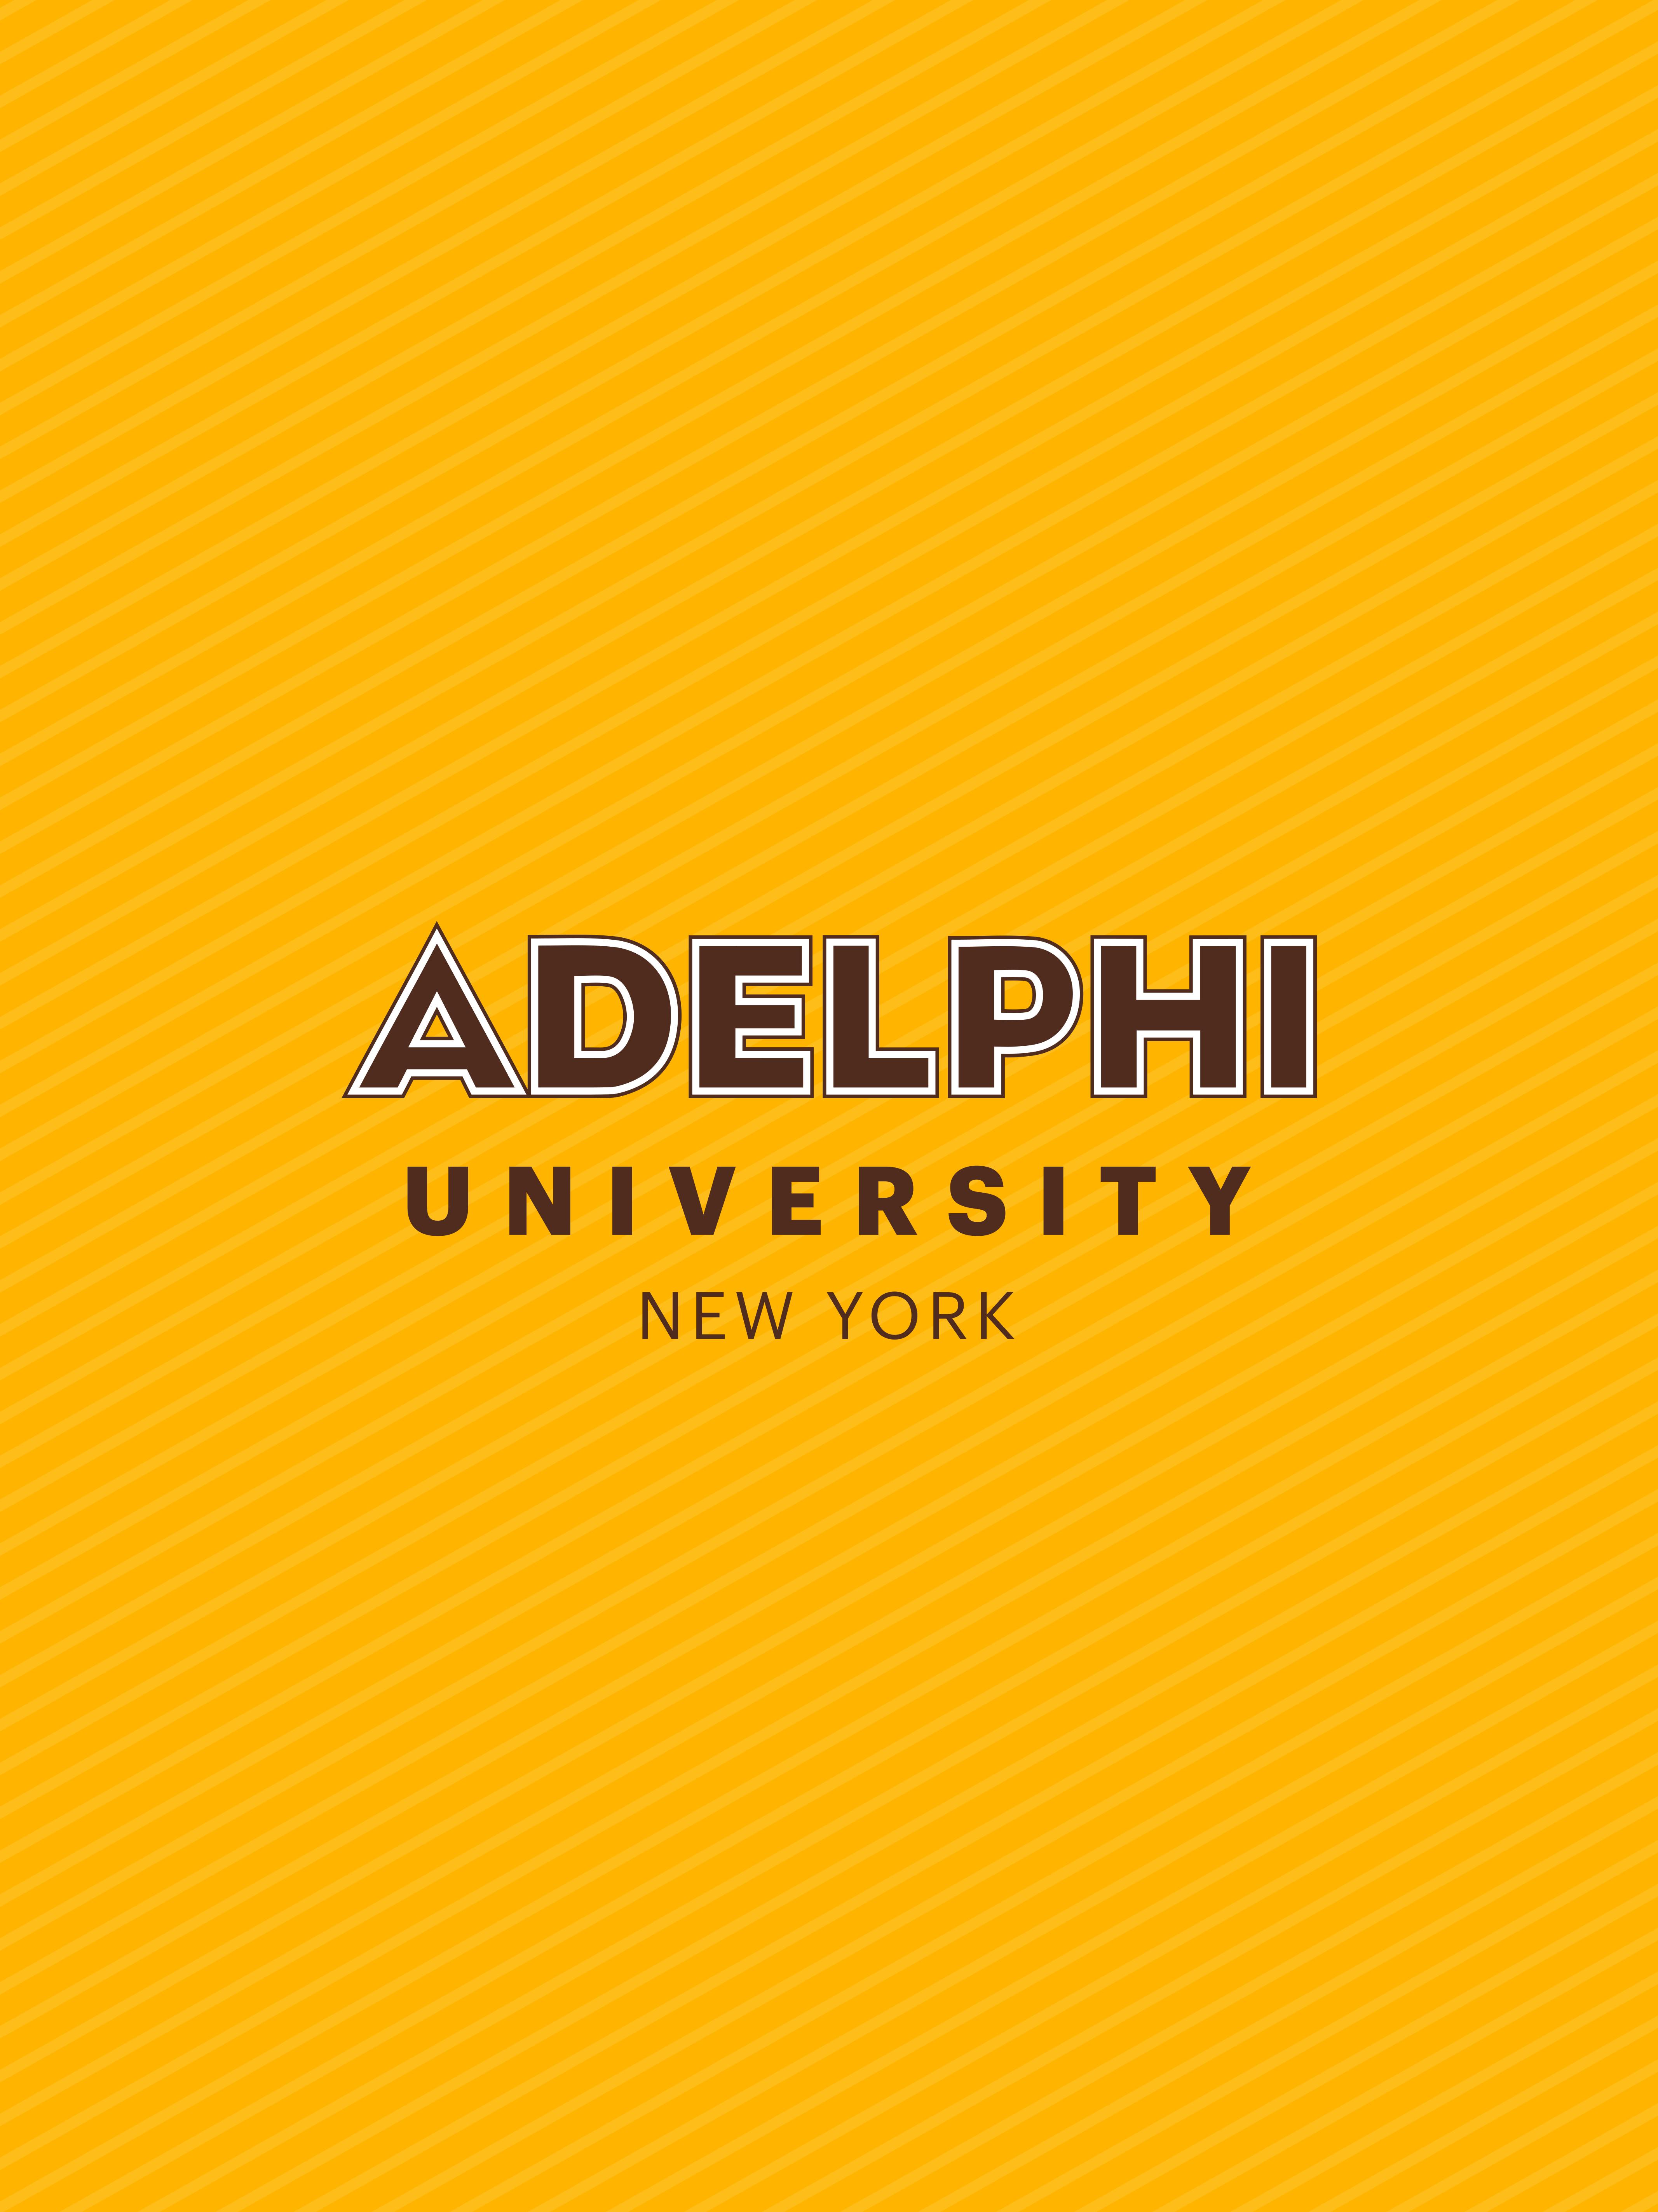 Tablet - Adelphi Gold Wallpaper